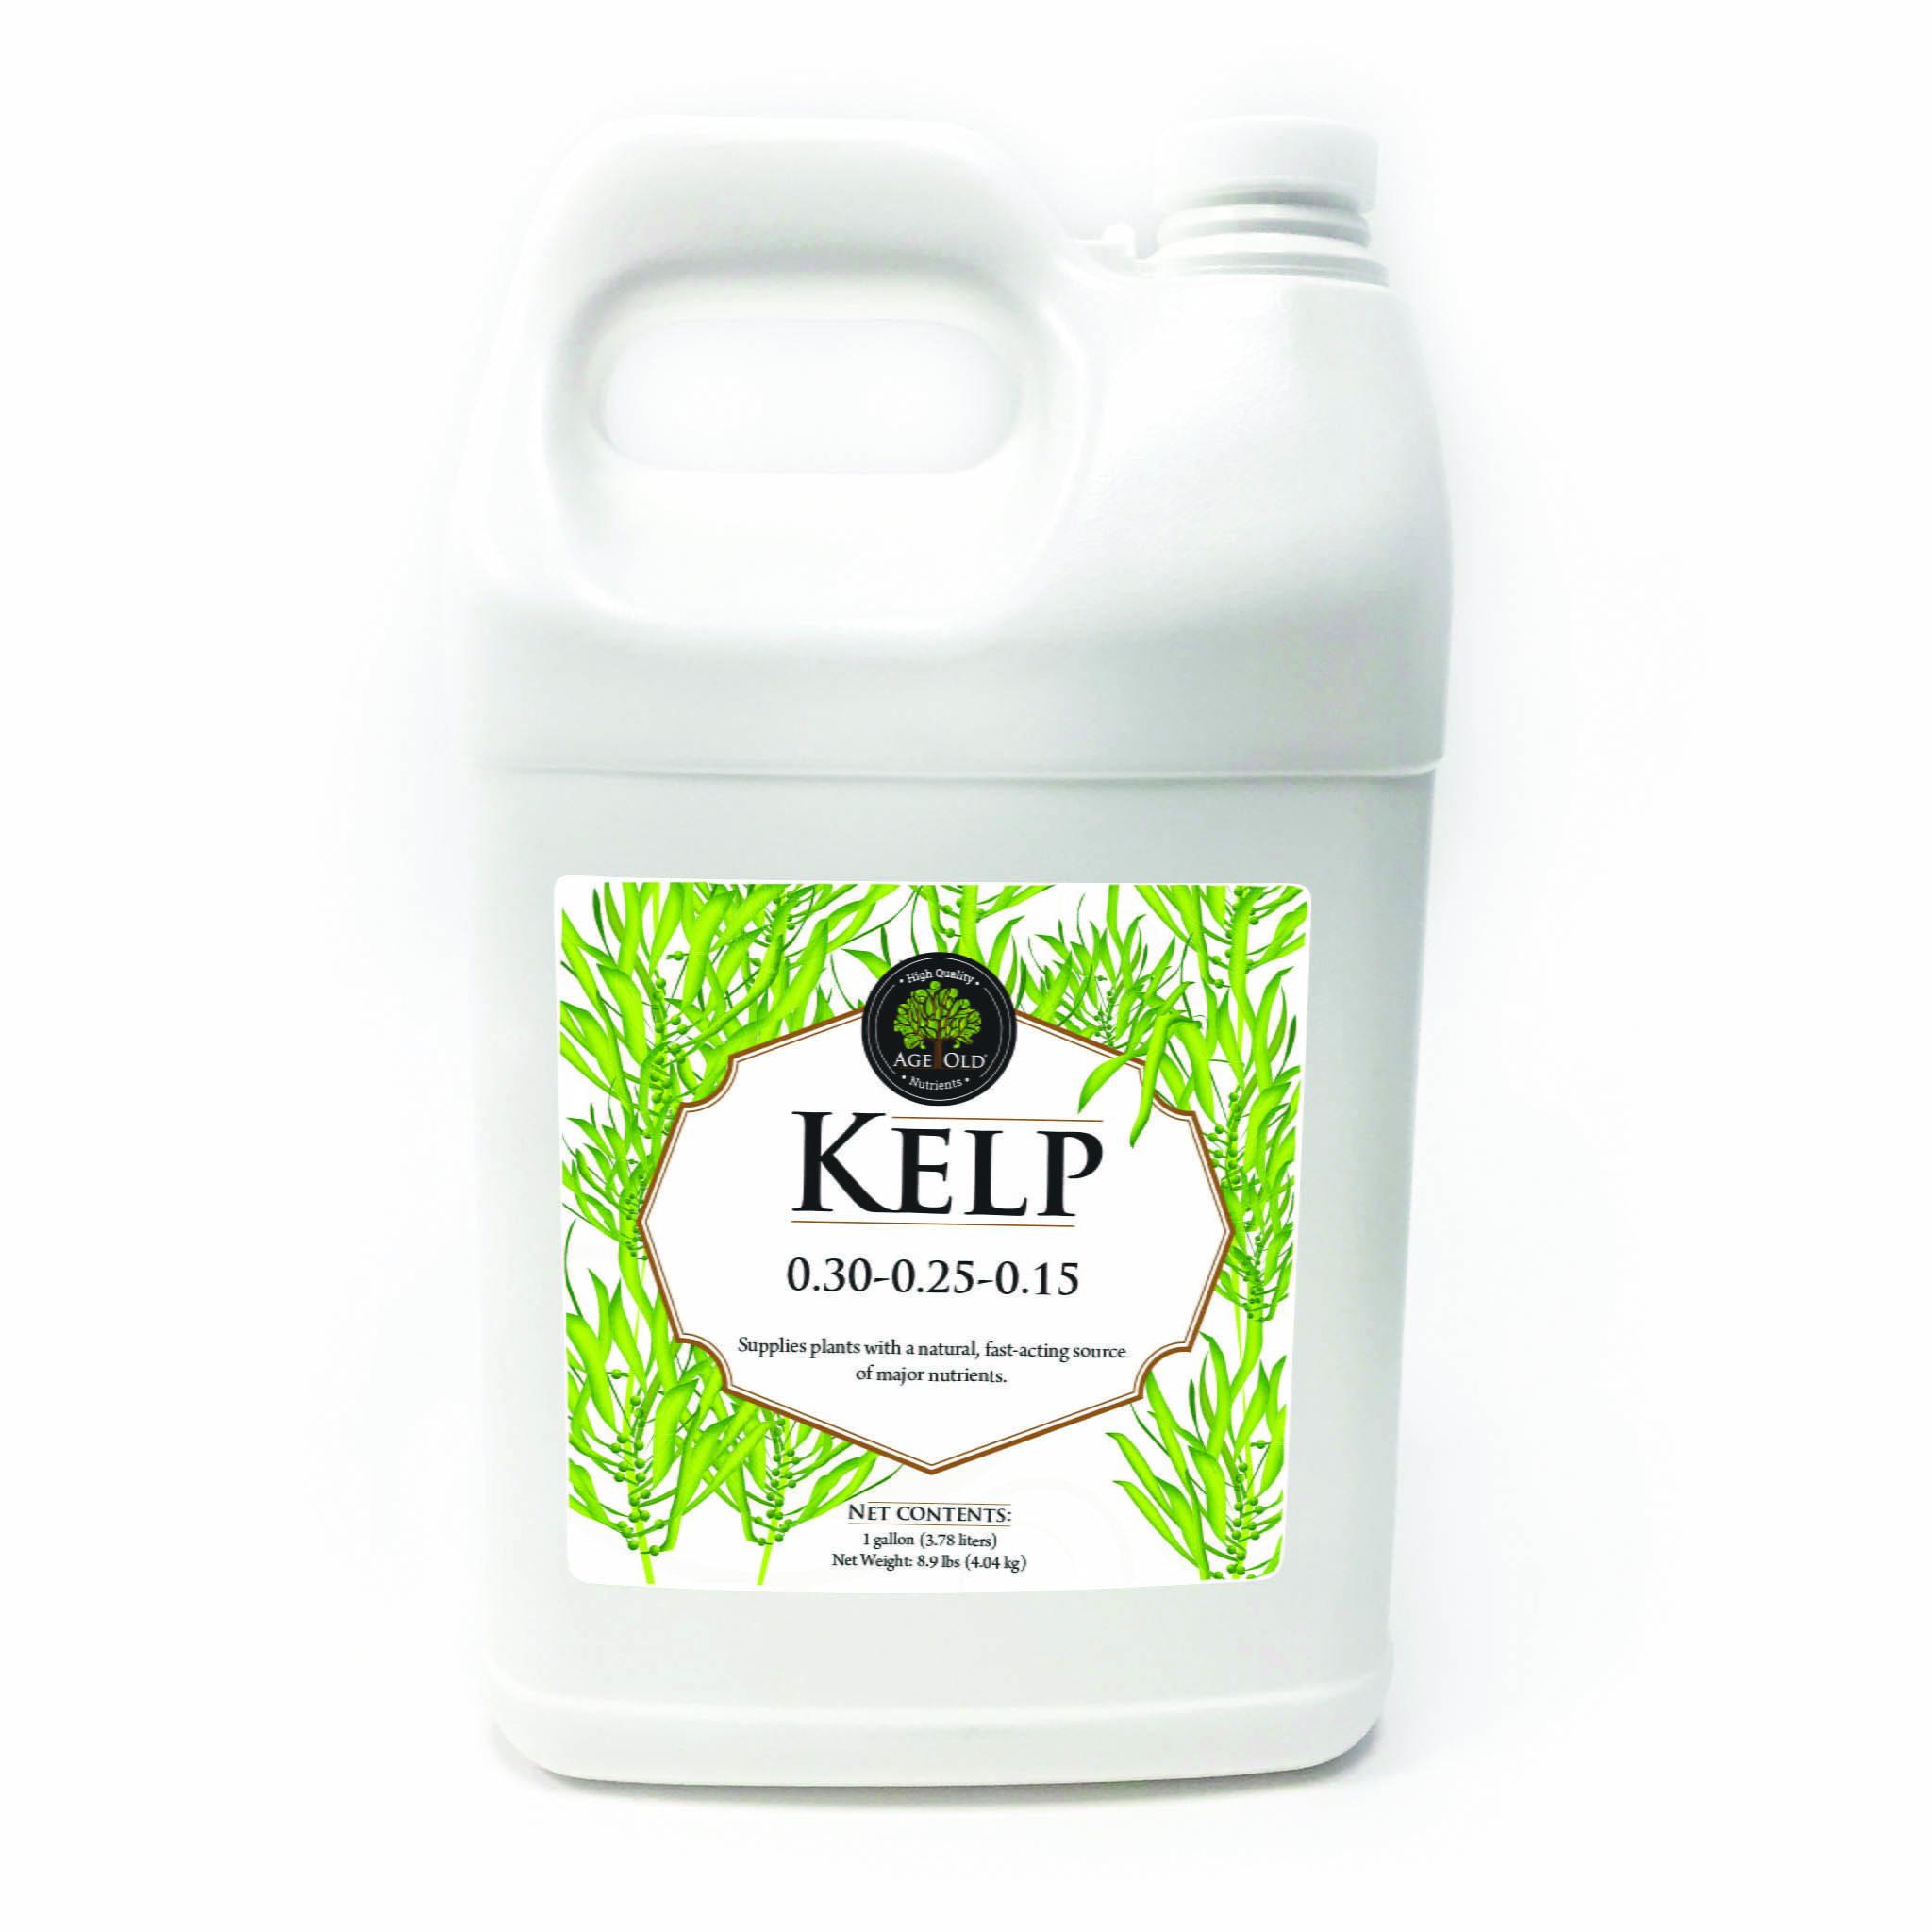 1 gallon of Kelp